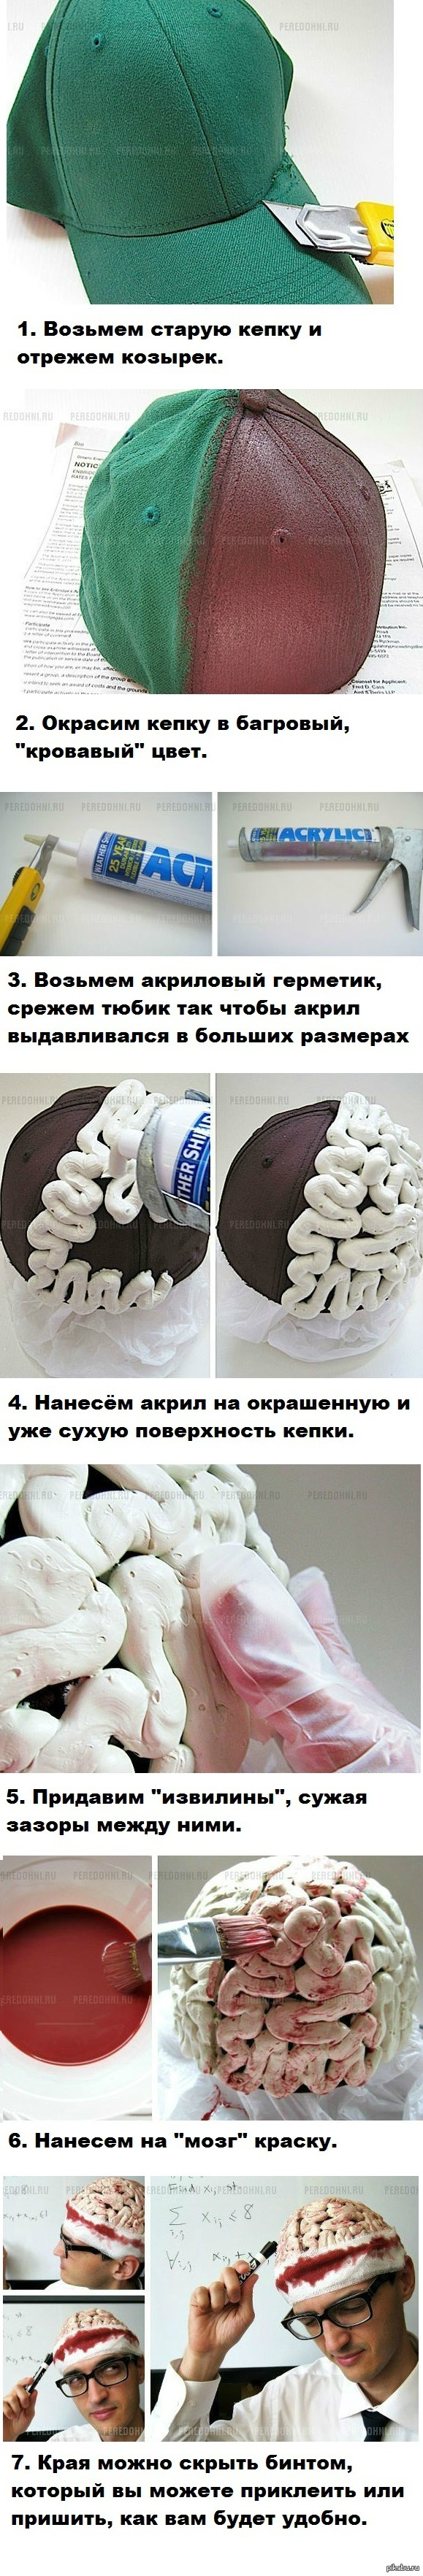 http://s.pikabu.ru/post_img/2013/10/23/10/1382541701_470337709.jpg